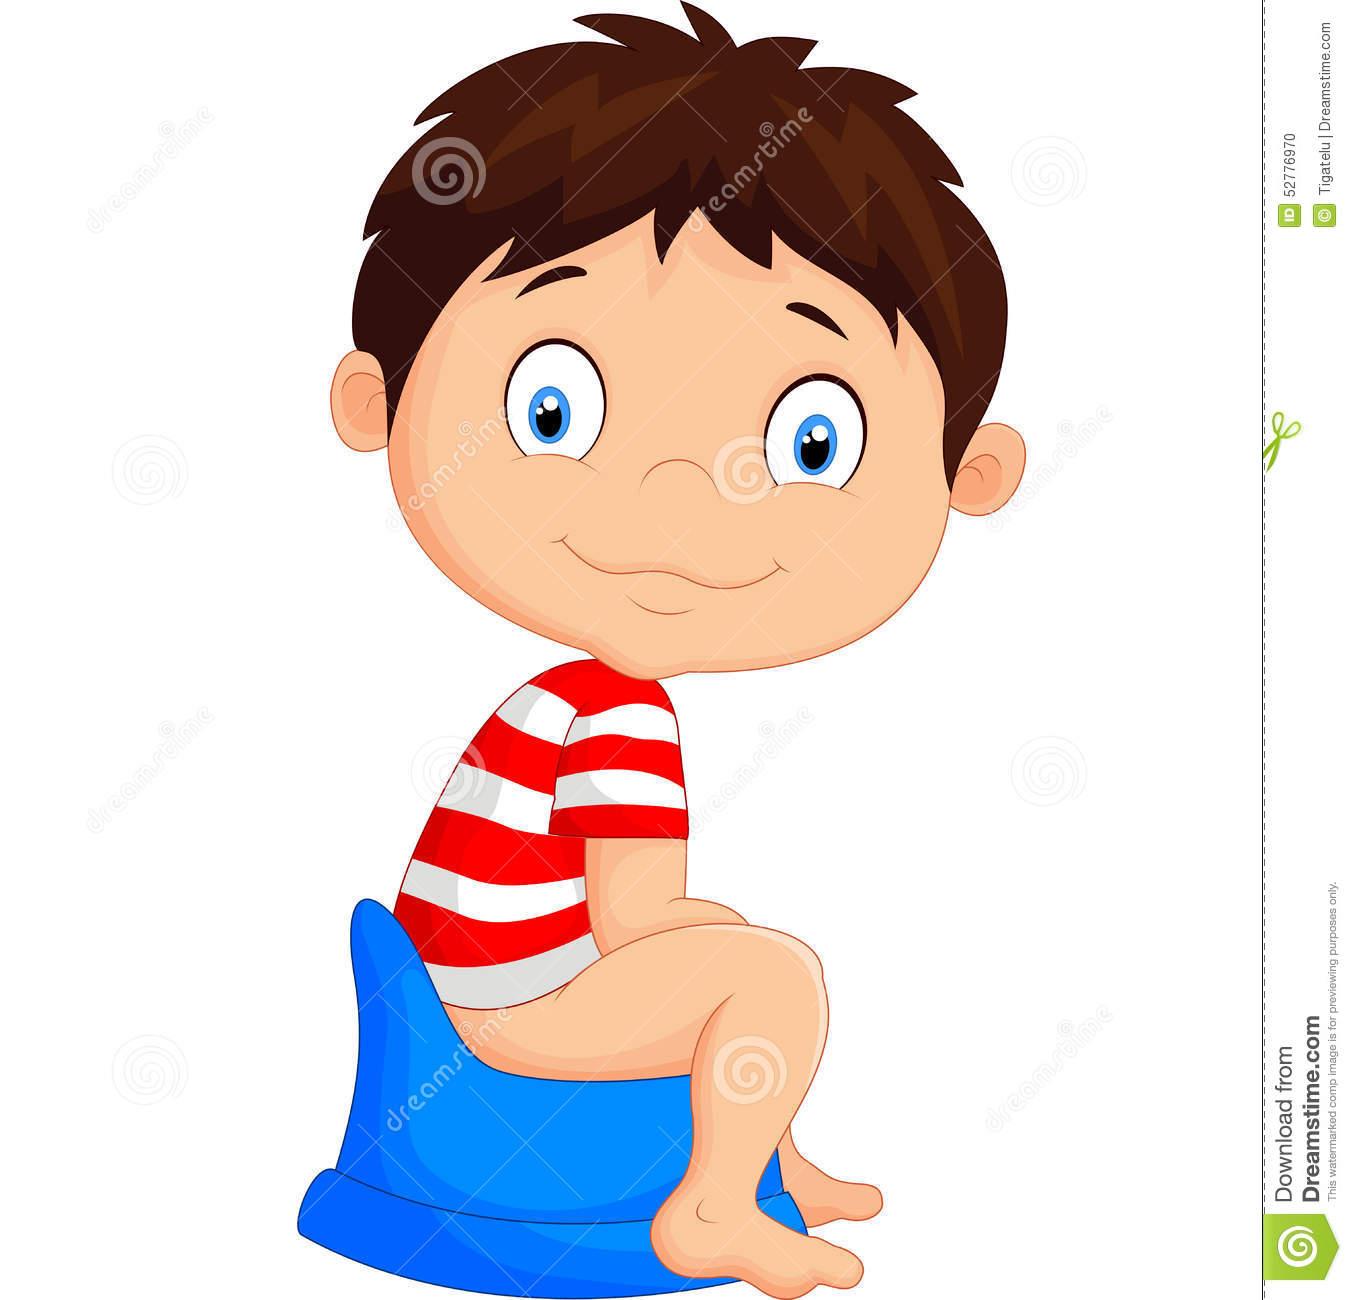 Boys potty clipart clipart free library Potty Training Clipart   Free download best Potty Training Clipart ... clipart free library